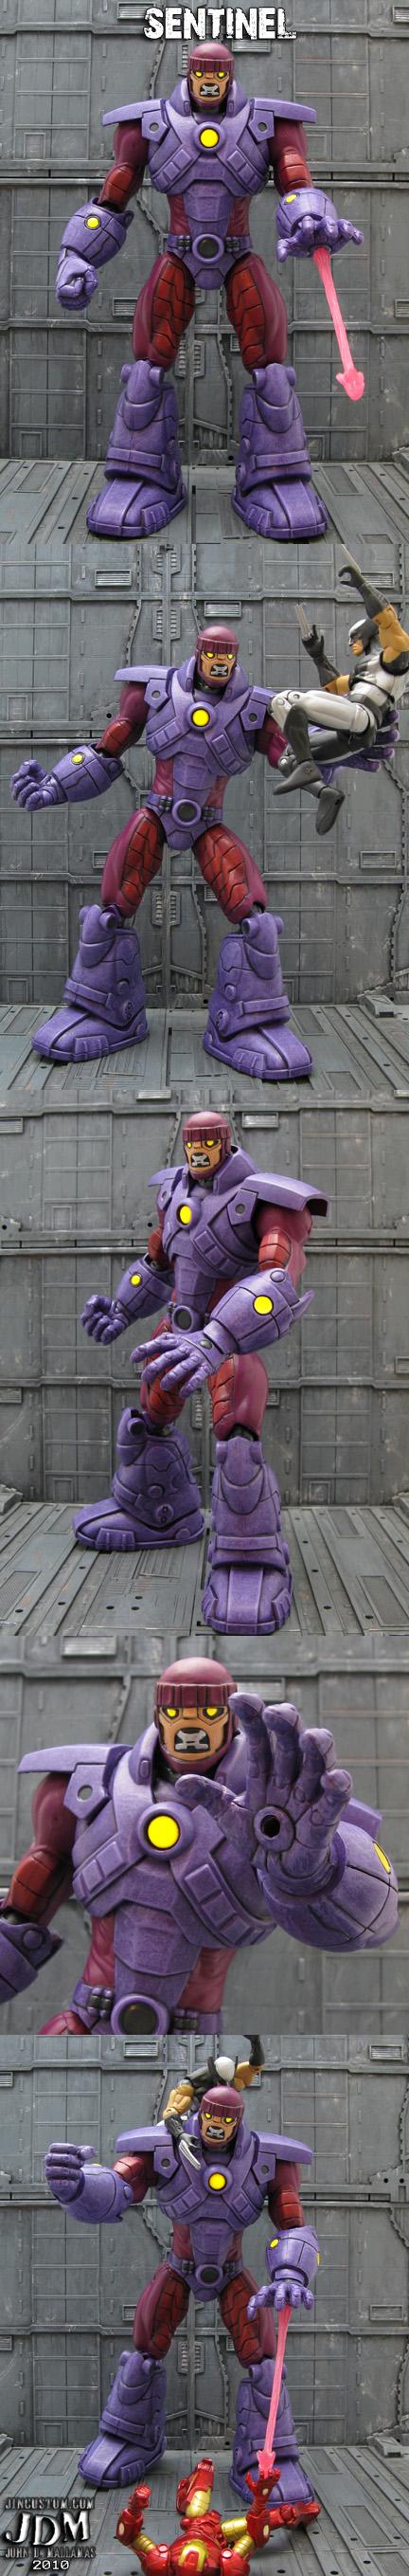 Custom Sentinel